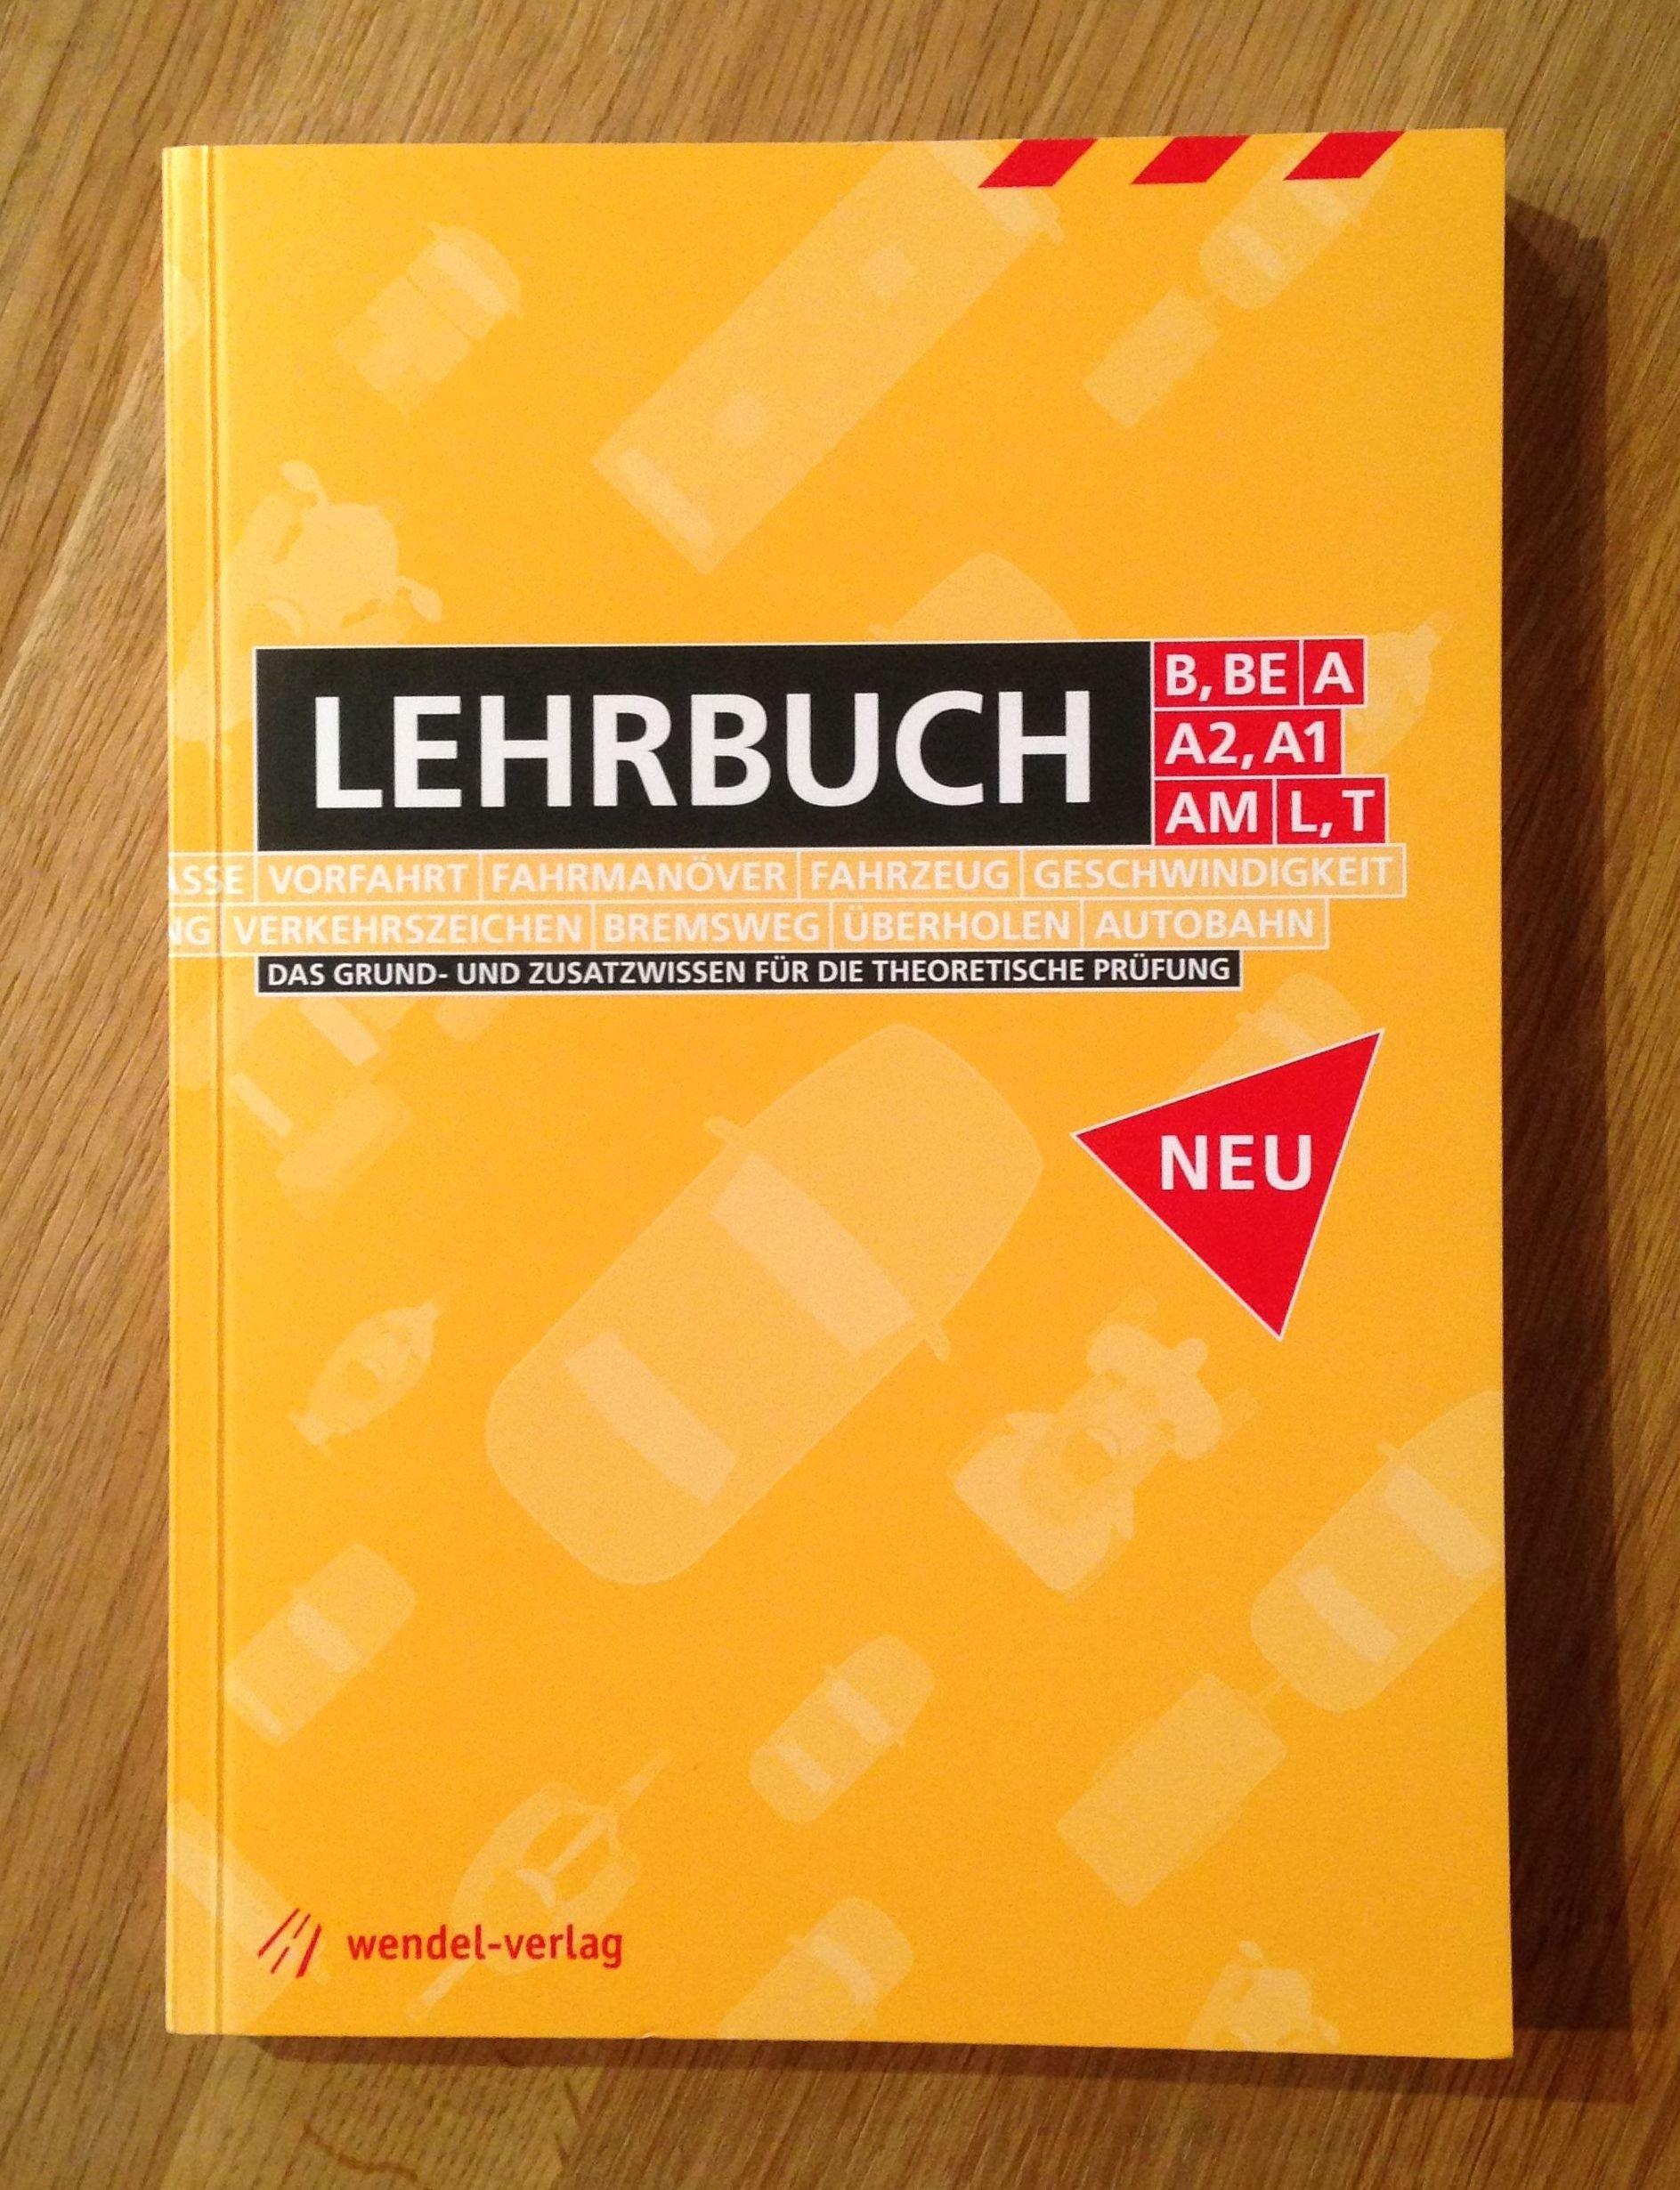 Wendel Verlag führerschein lehrbuch klasse b be a a2 a1 am l t